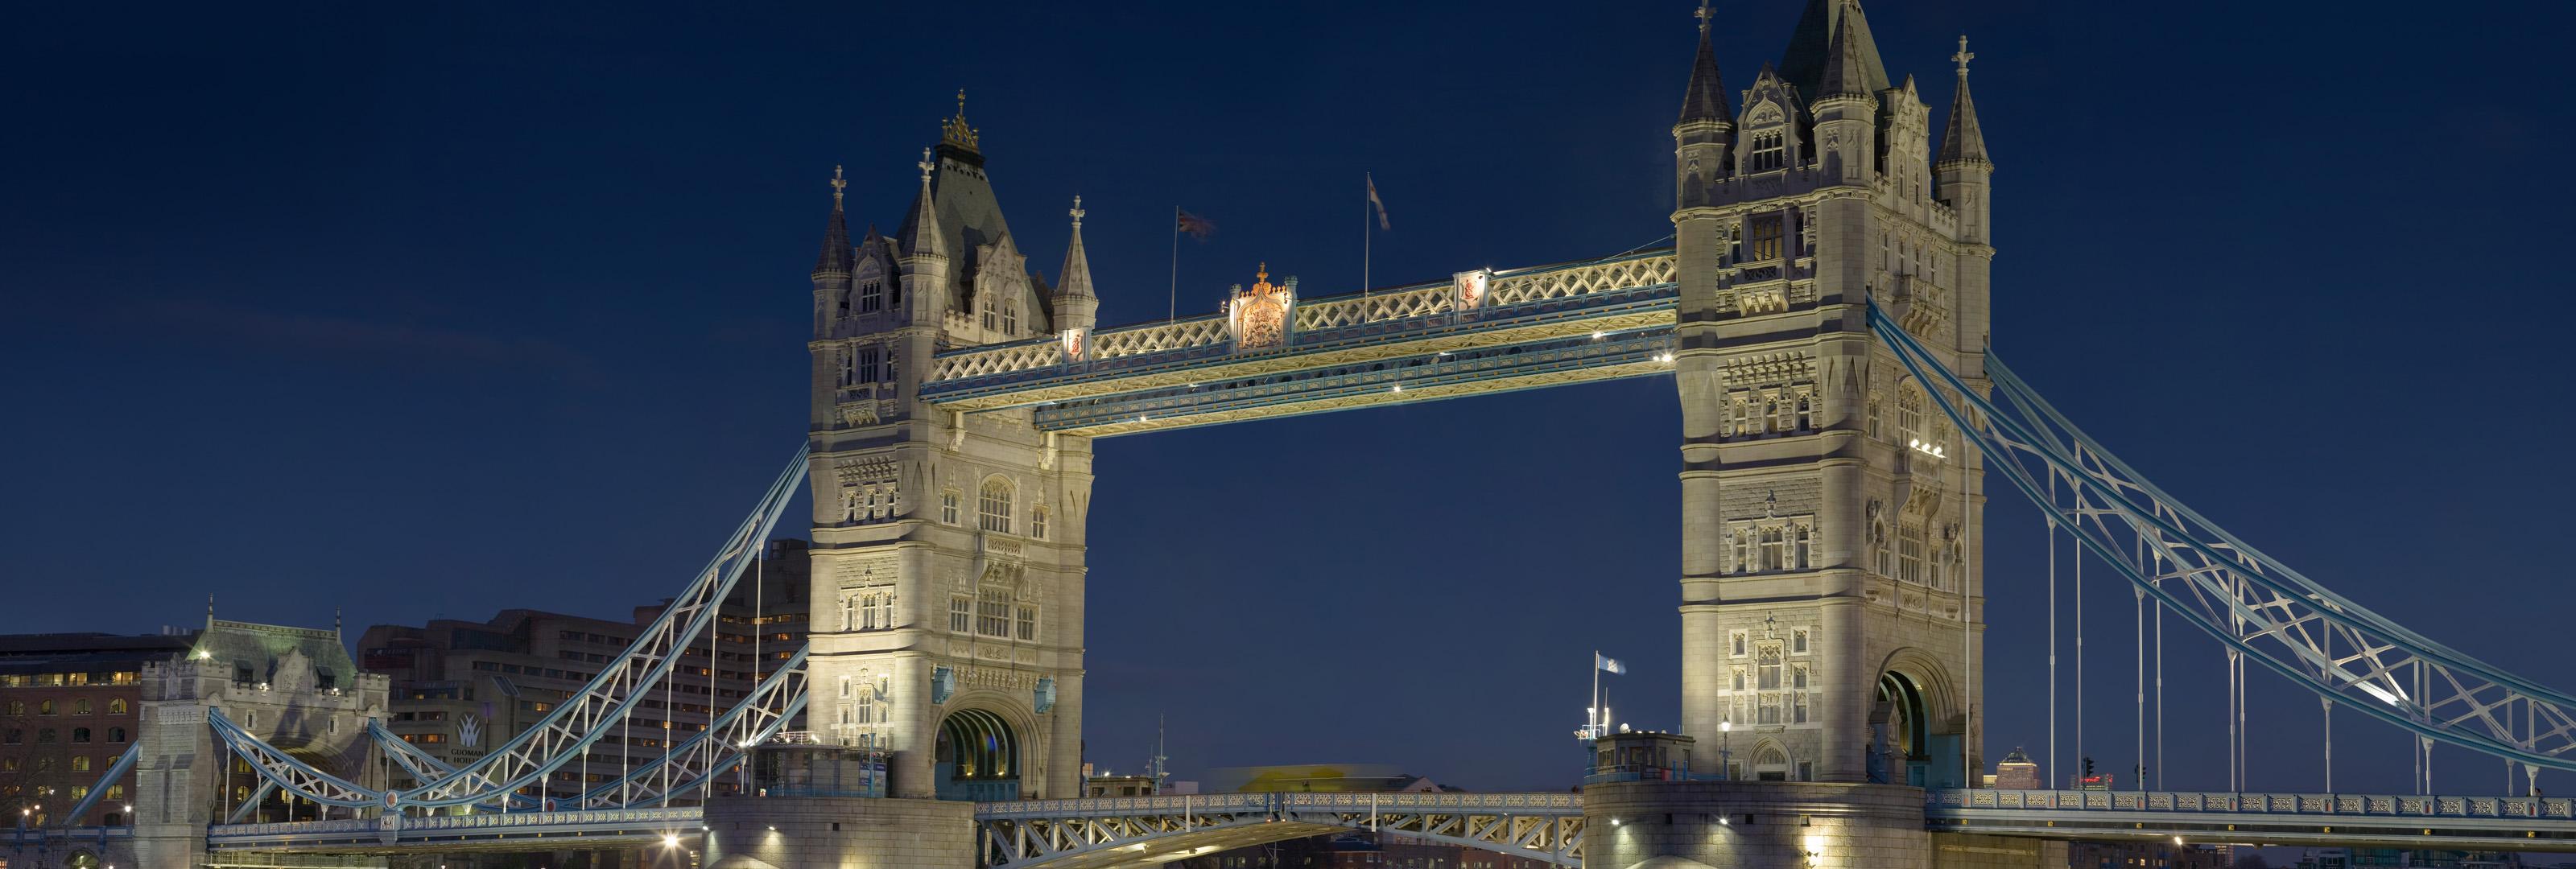 bridge | free desktop wallpapers for widescreen, hd and mobile